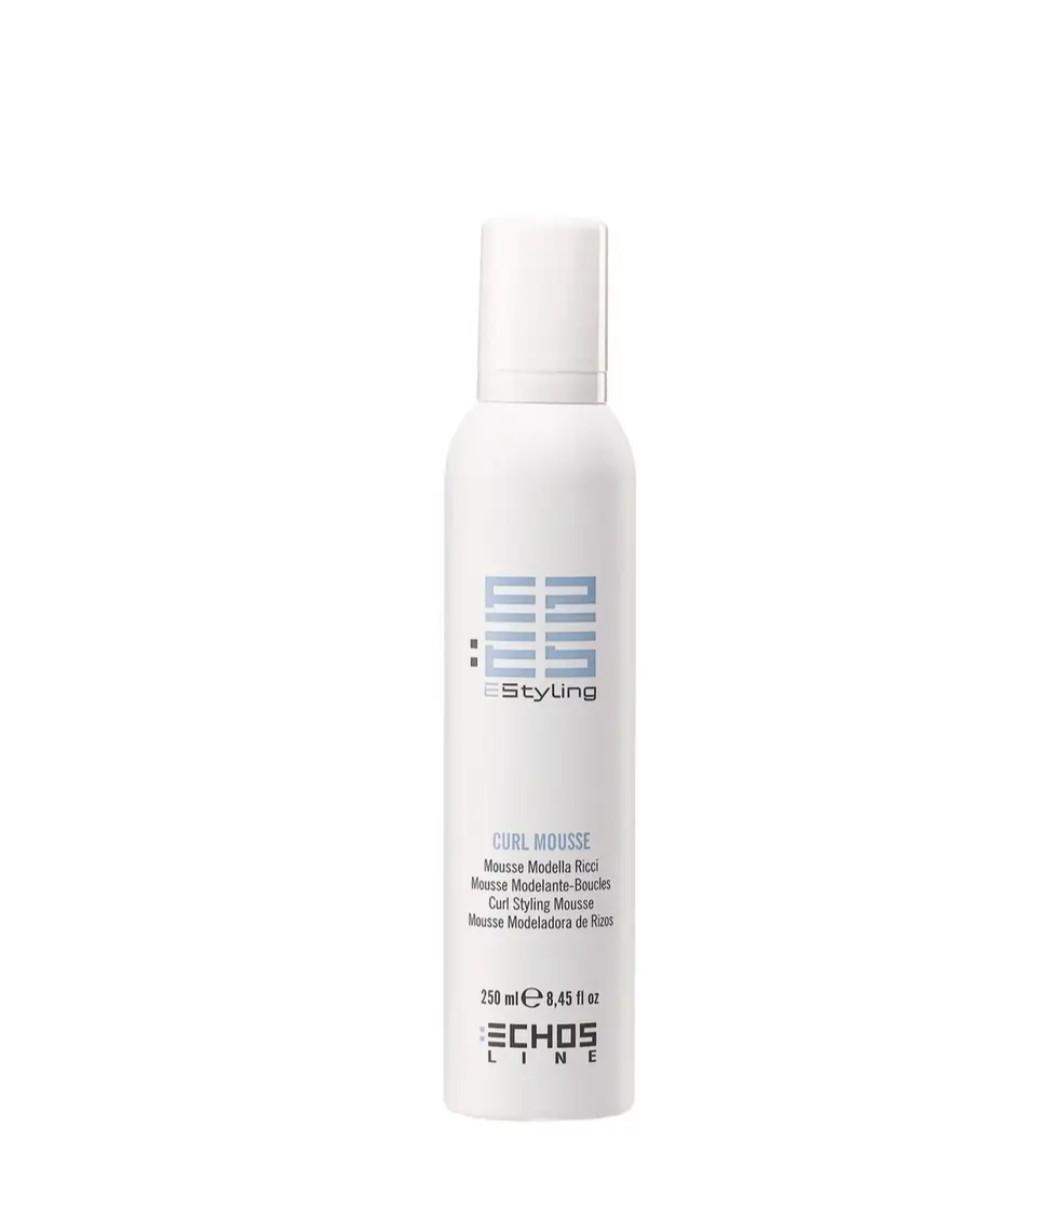 Мус-активатор для кучерявого волосся, Volume and Straight, Echosline, 250 мл